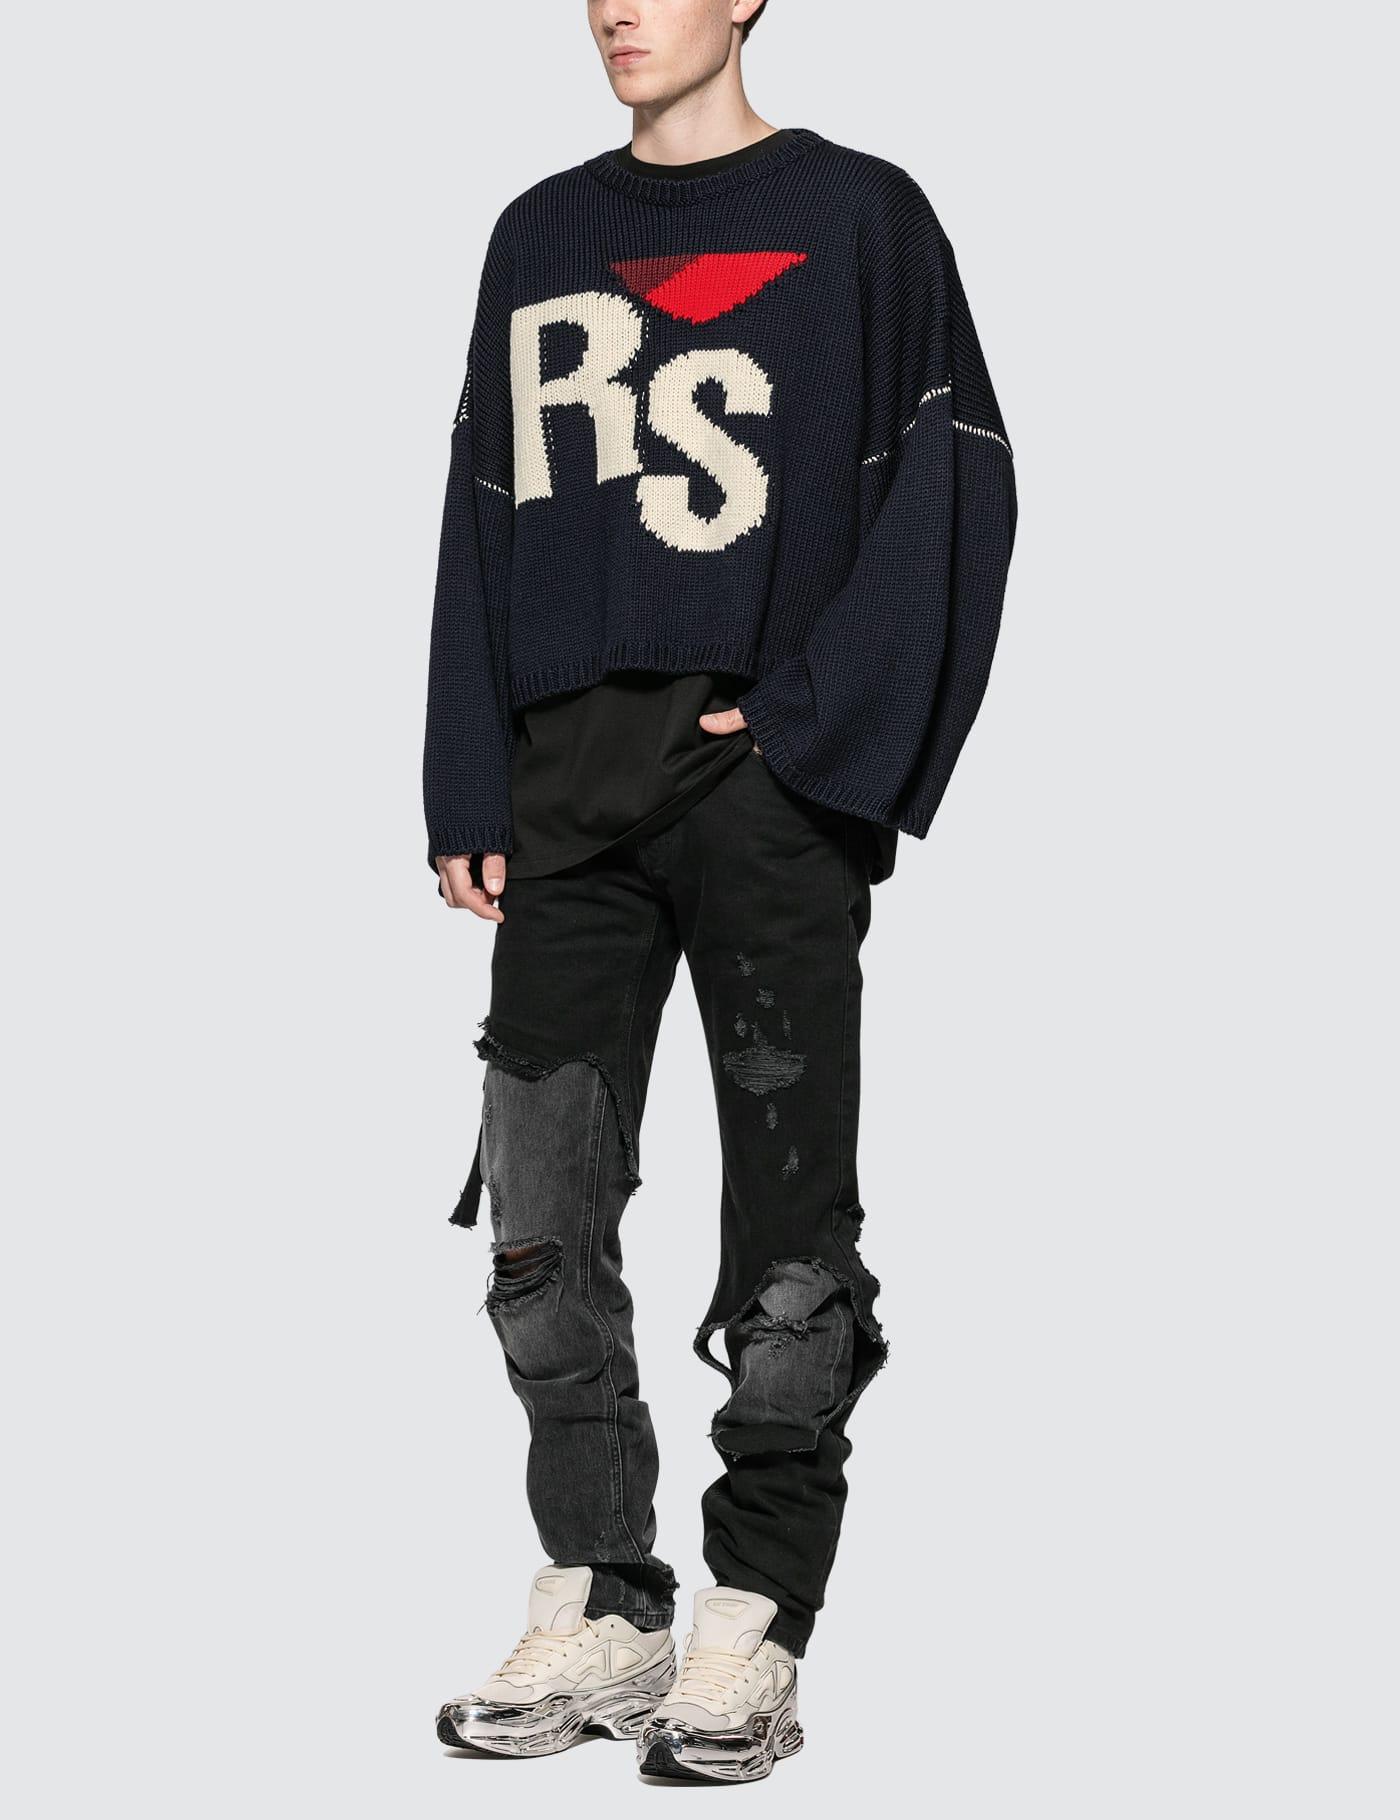 Raf Simons - Big Fit Tour T-shirt | HBX